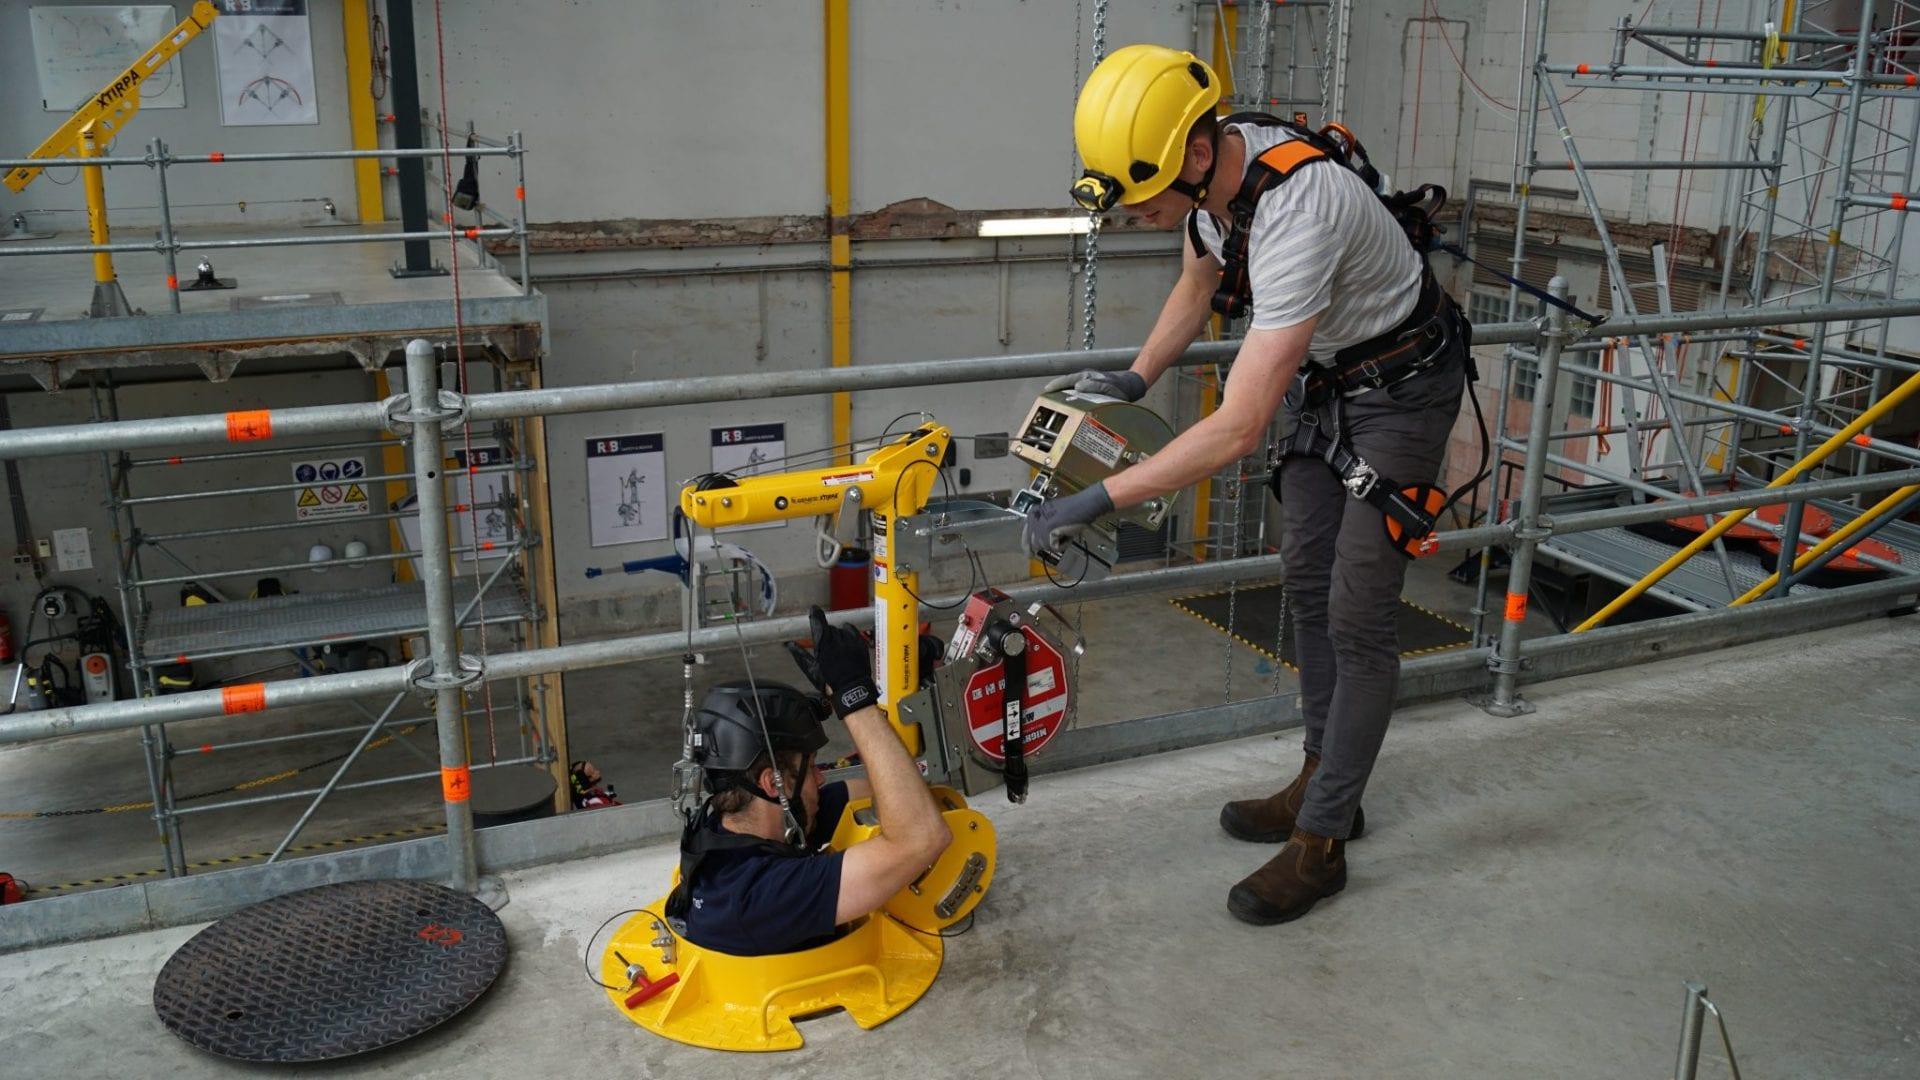 Redding besloten ruimtes | R3B Safety & Rescue